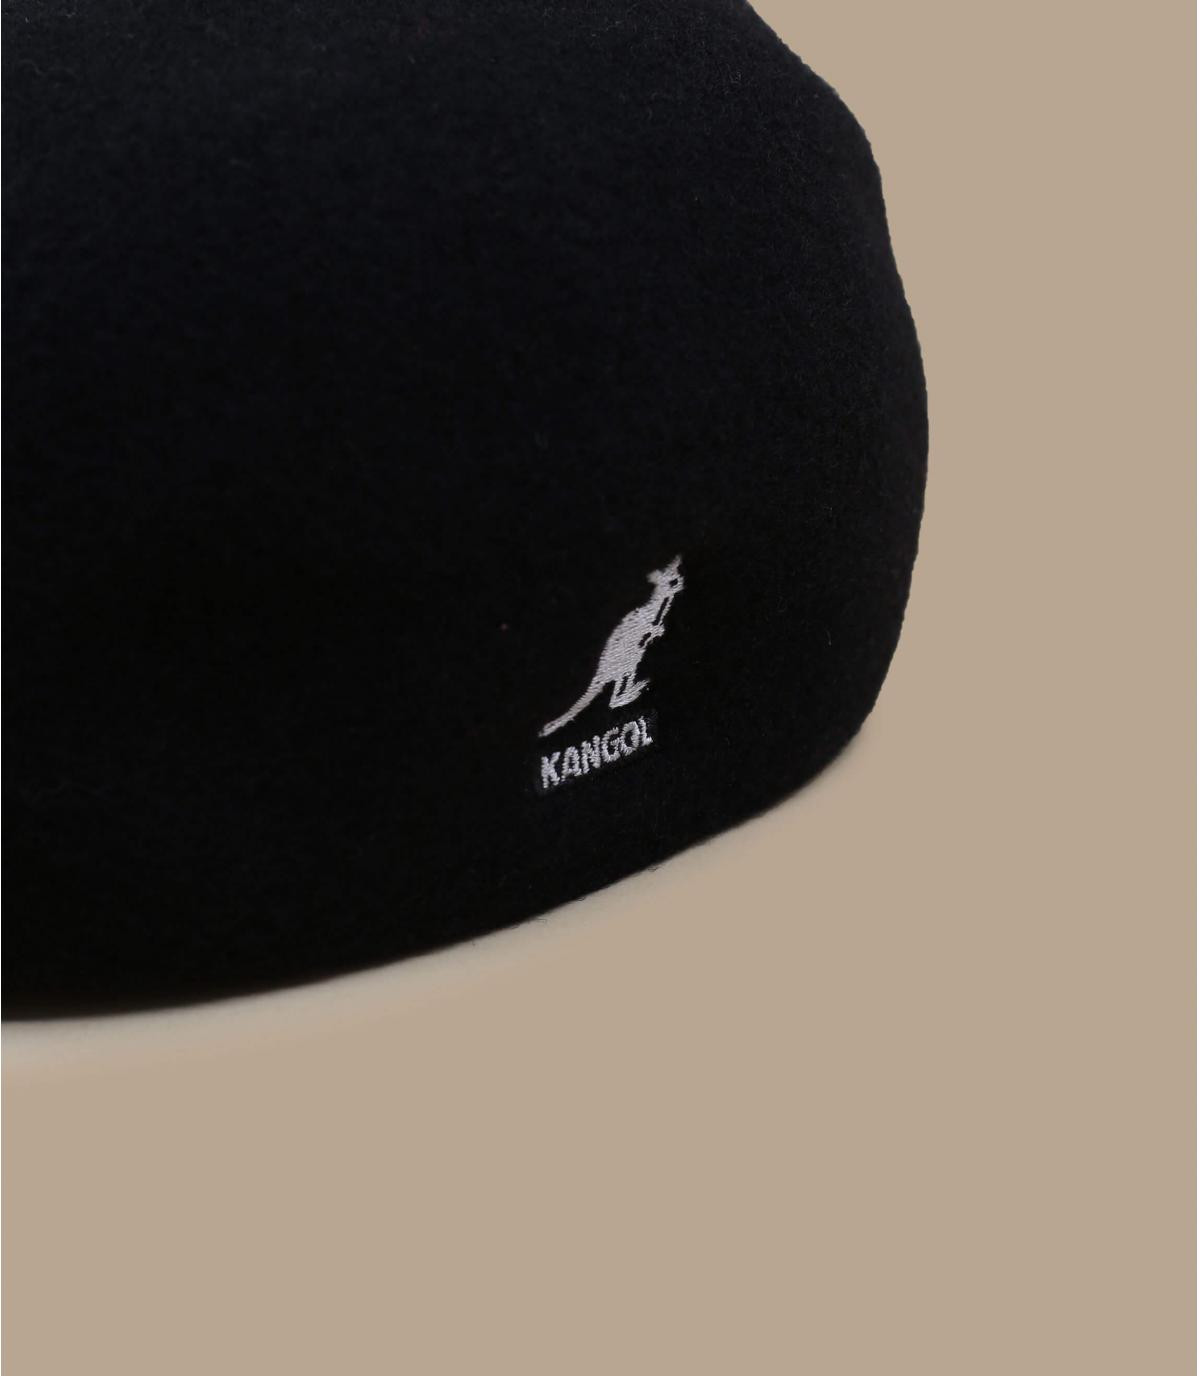 Black 507 ivy cap - 507 wool seamless black by Kangol. a63ae00a9cd